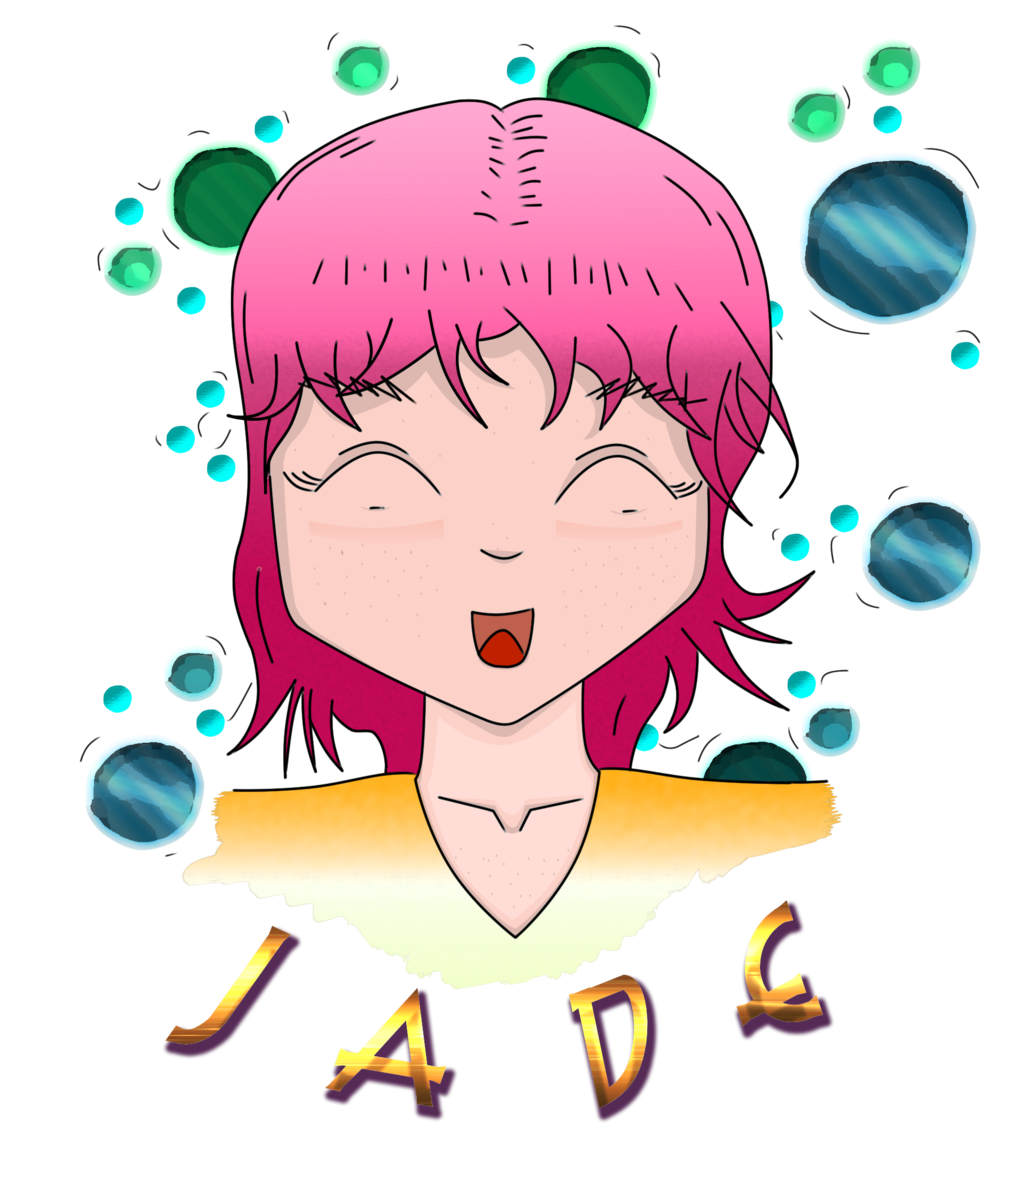 Most recent character: Jade,